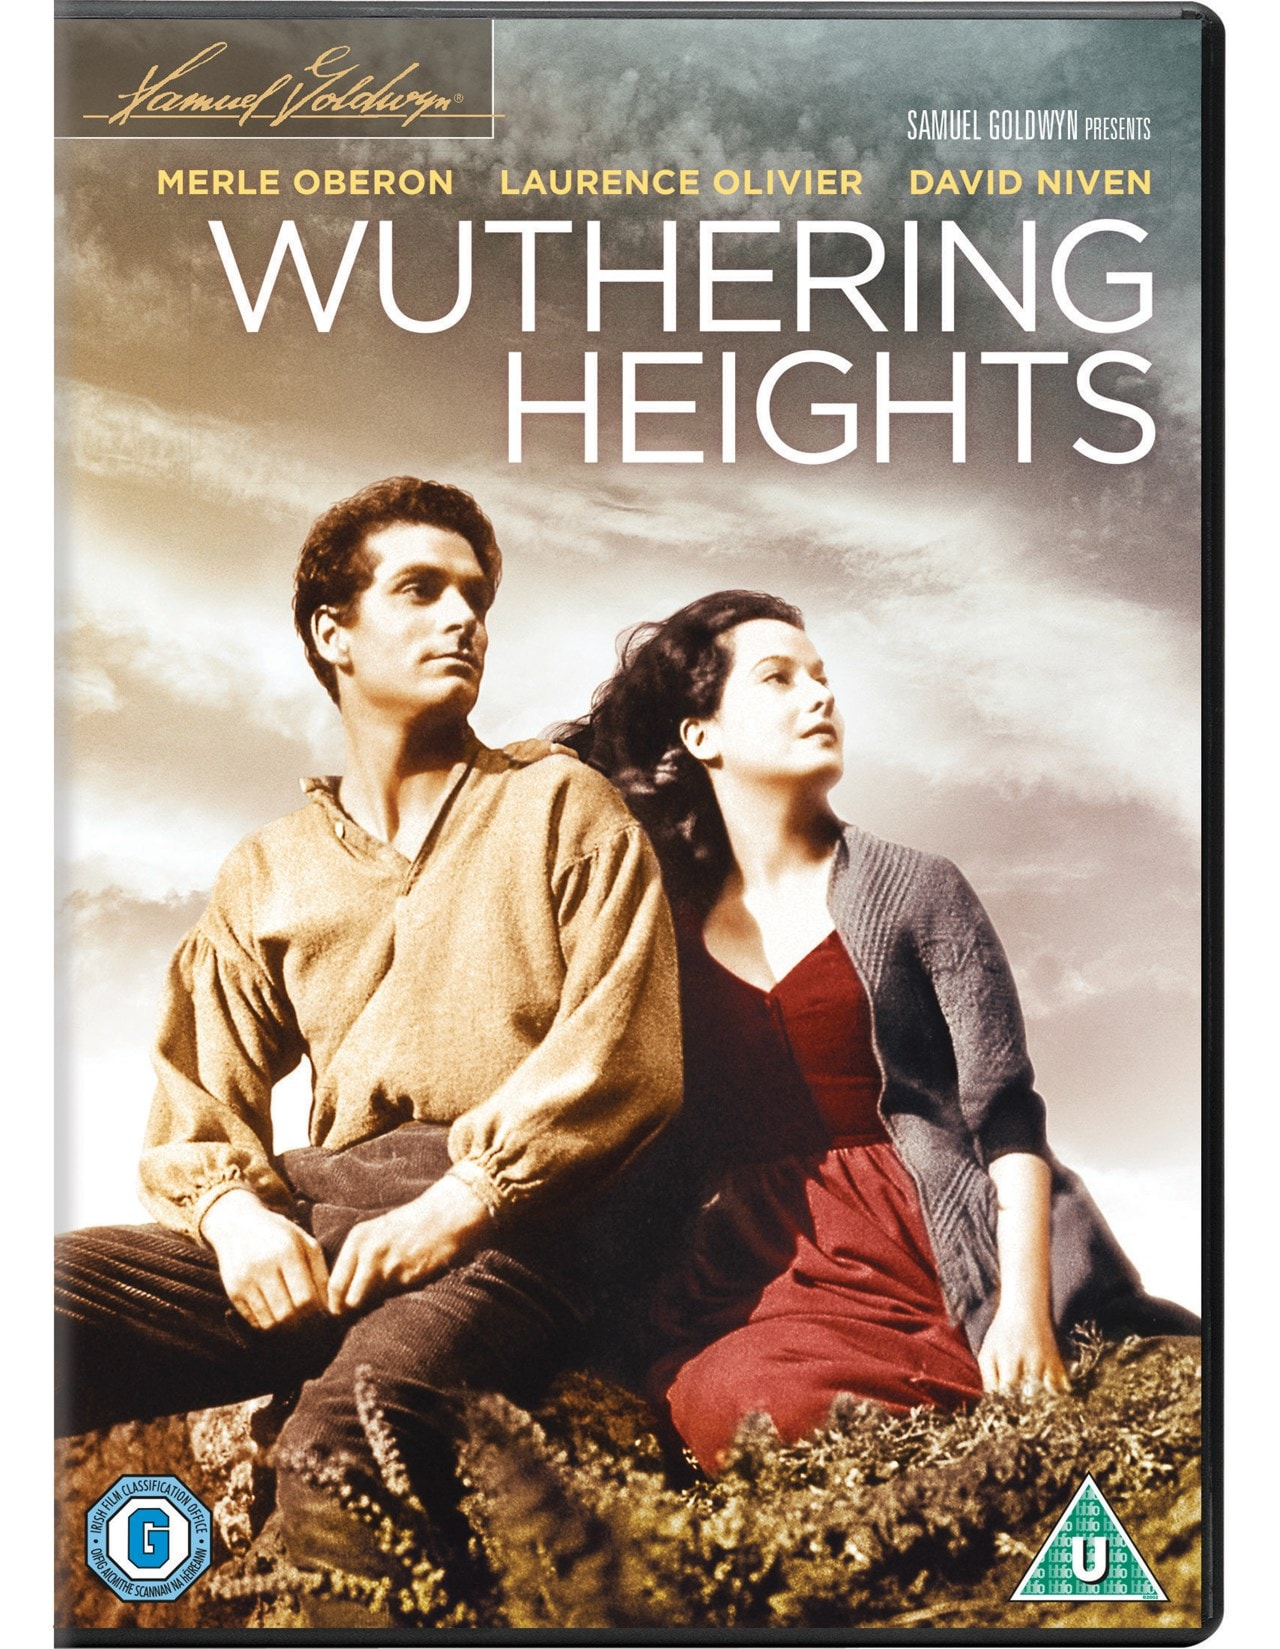 Wuthering Heights - Samuel Goldwyn Presents - 1